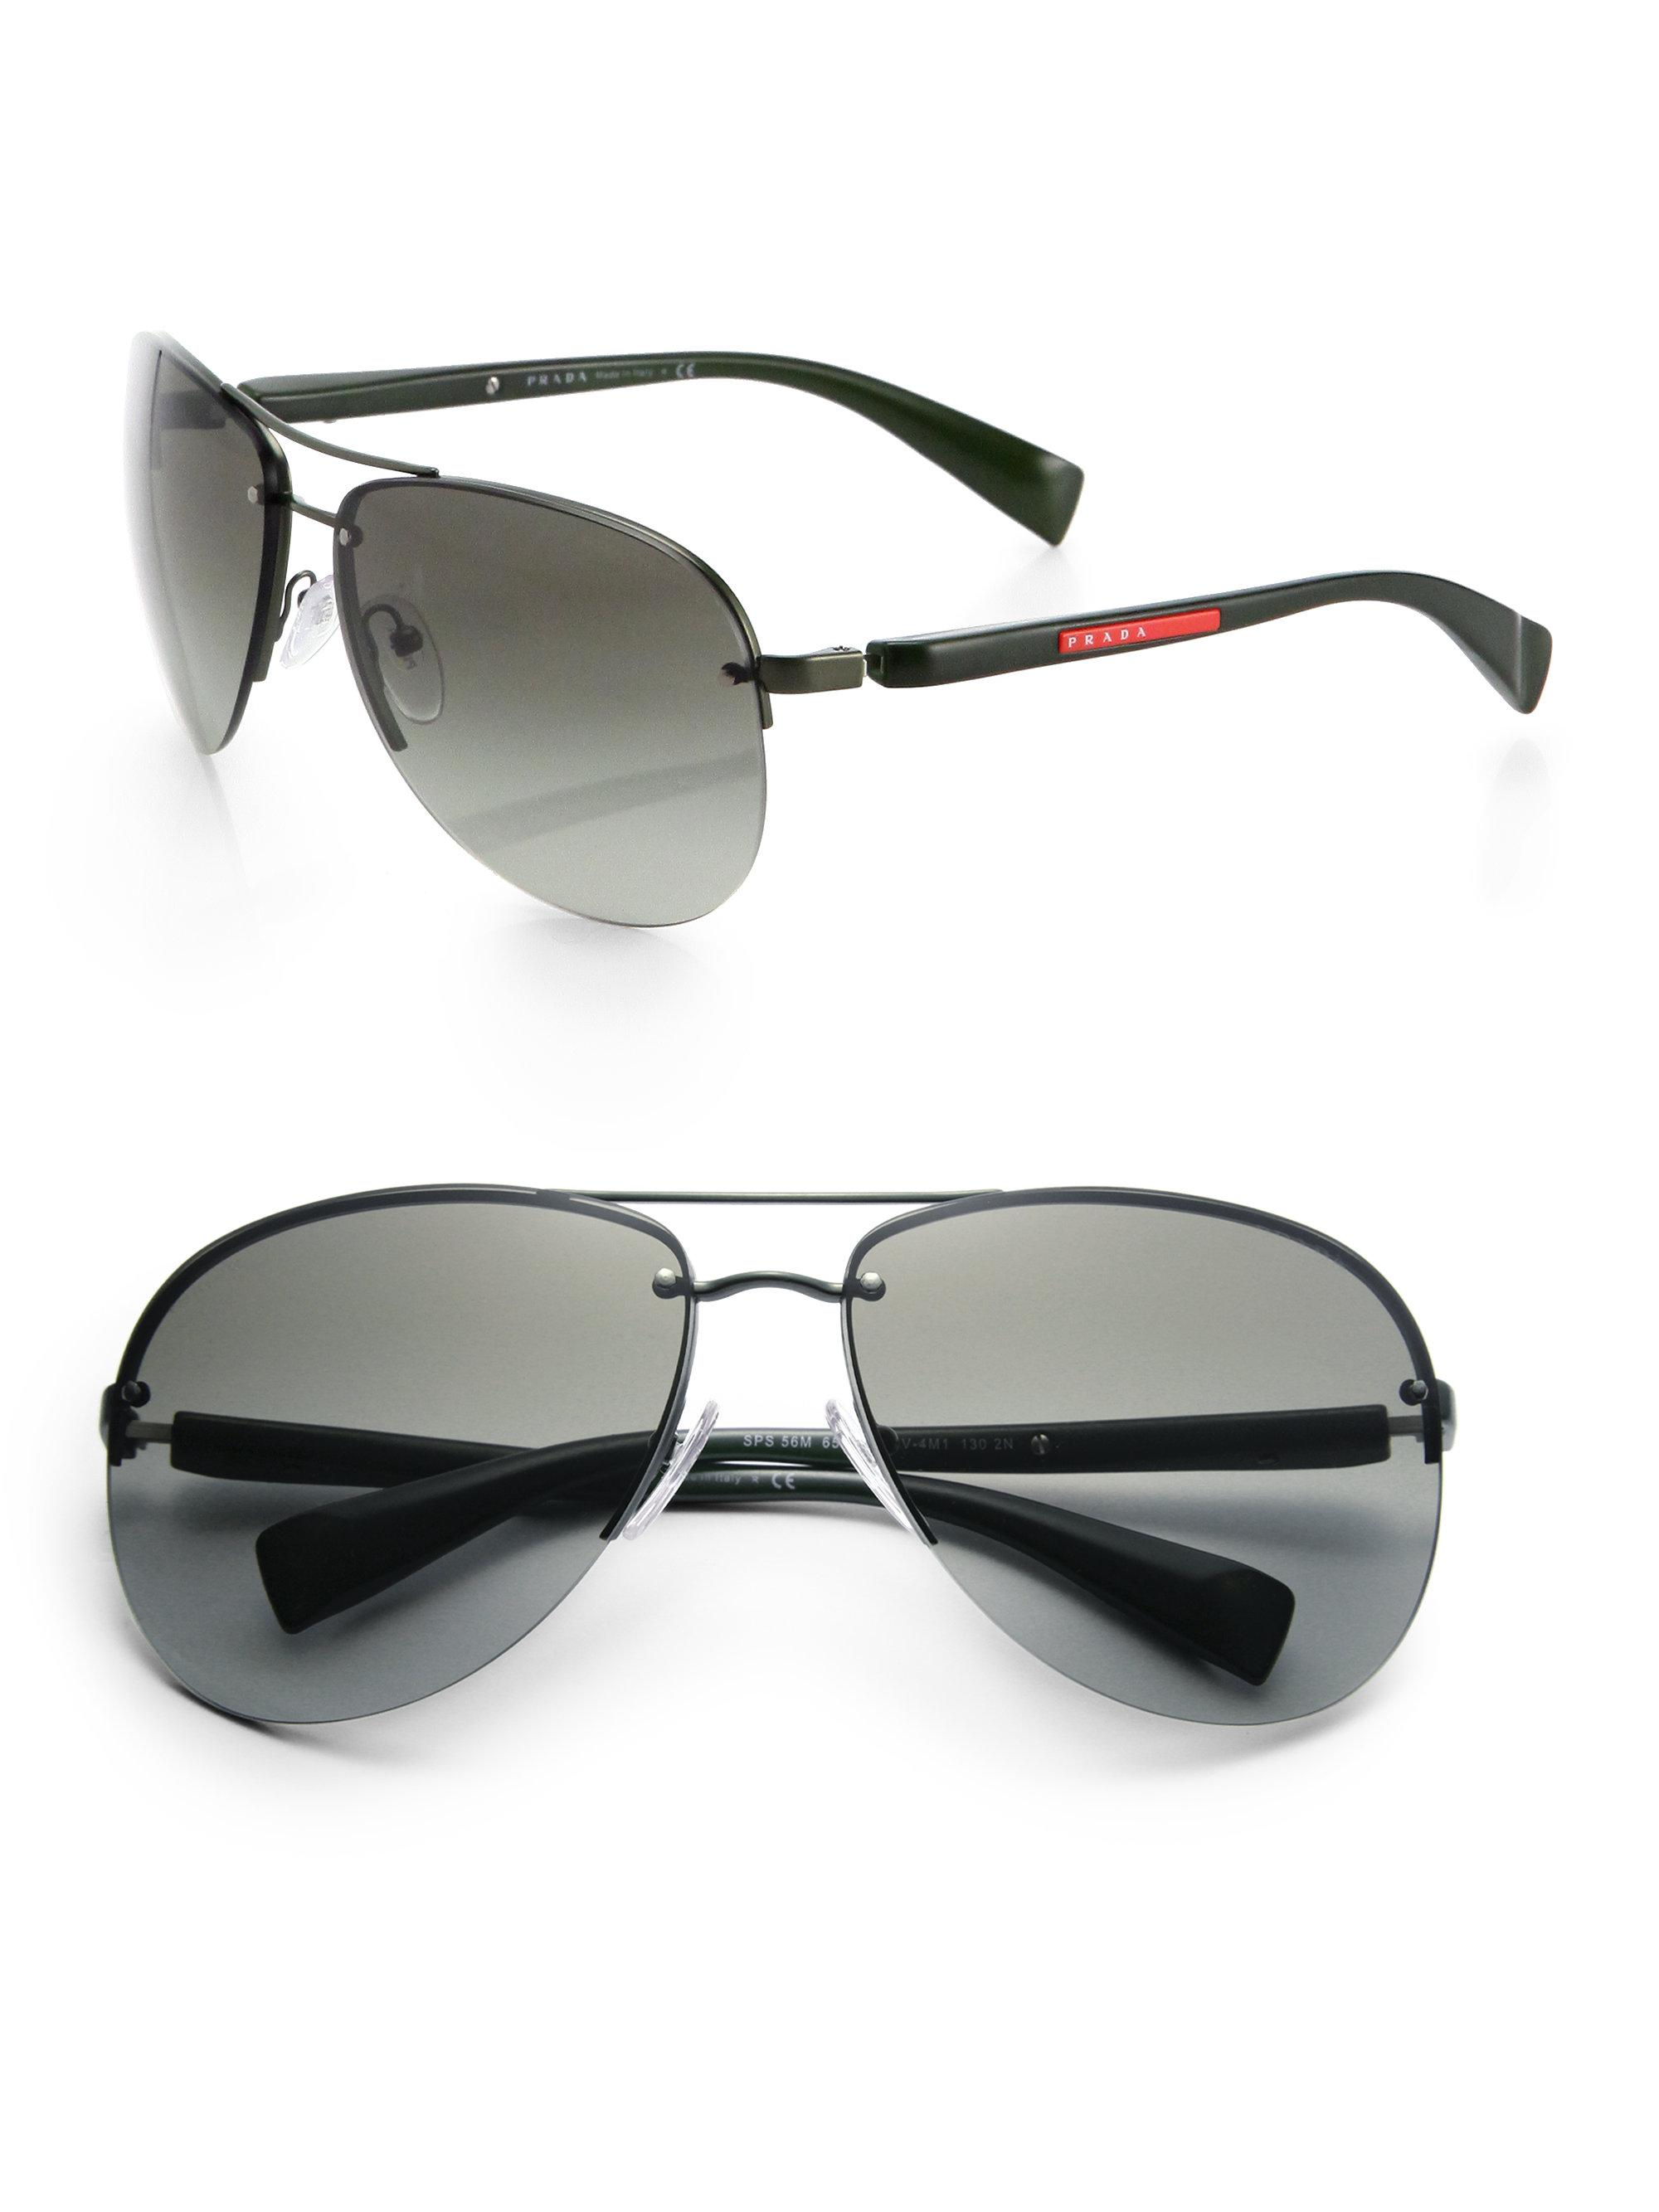 bc0953d8a243 Prada 65mm Oversized Aviator Sunglasses in Green for Men - Lyst